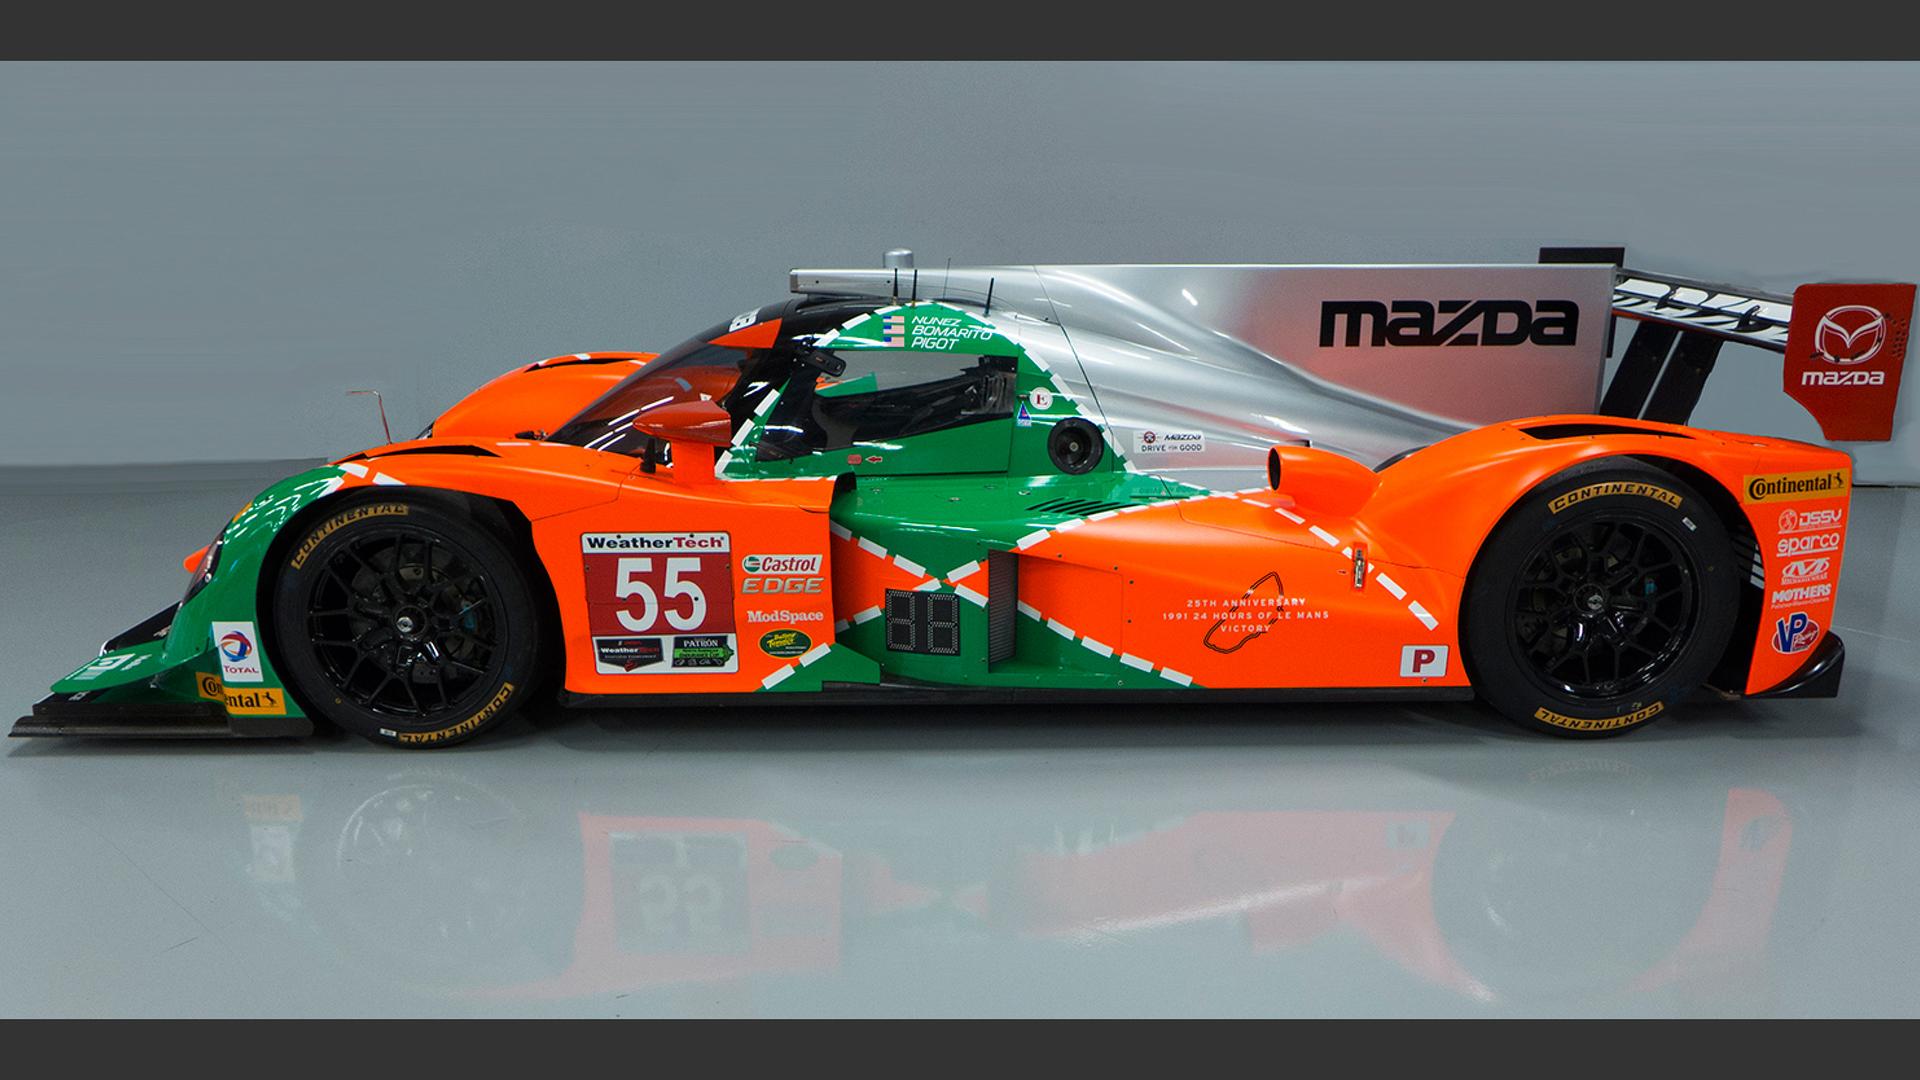 prototypes get vintage Le Mans livery for Watkins Glen race